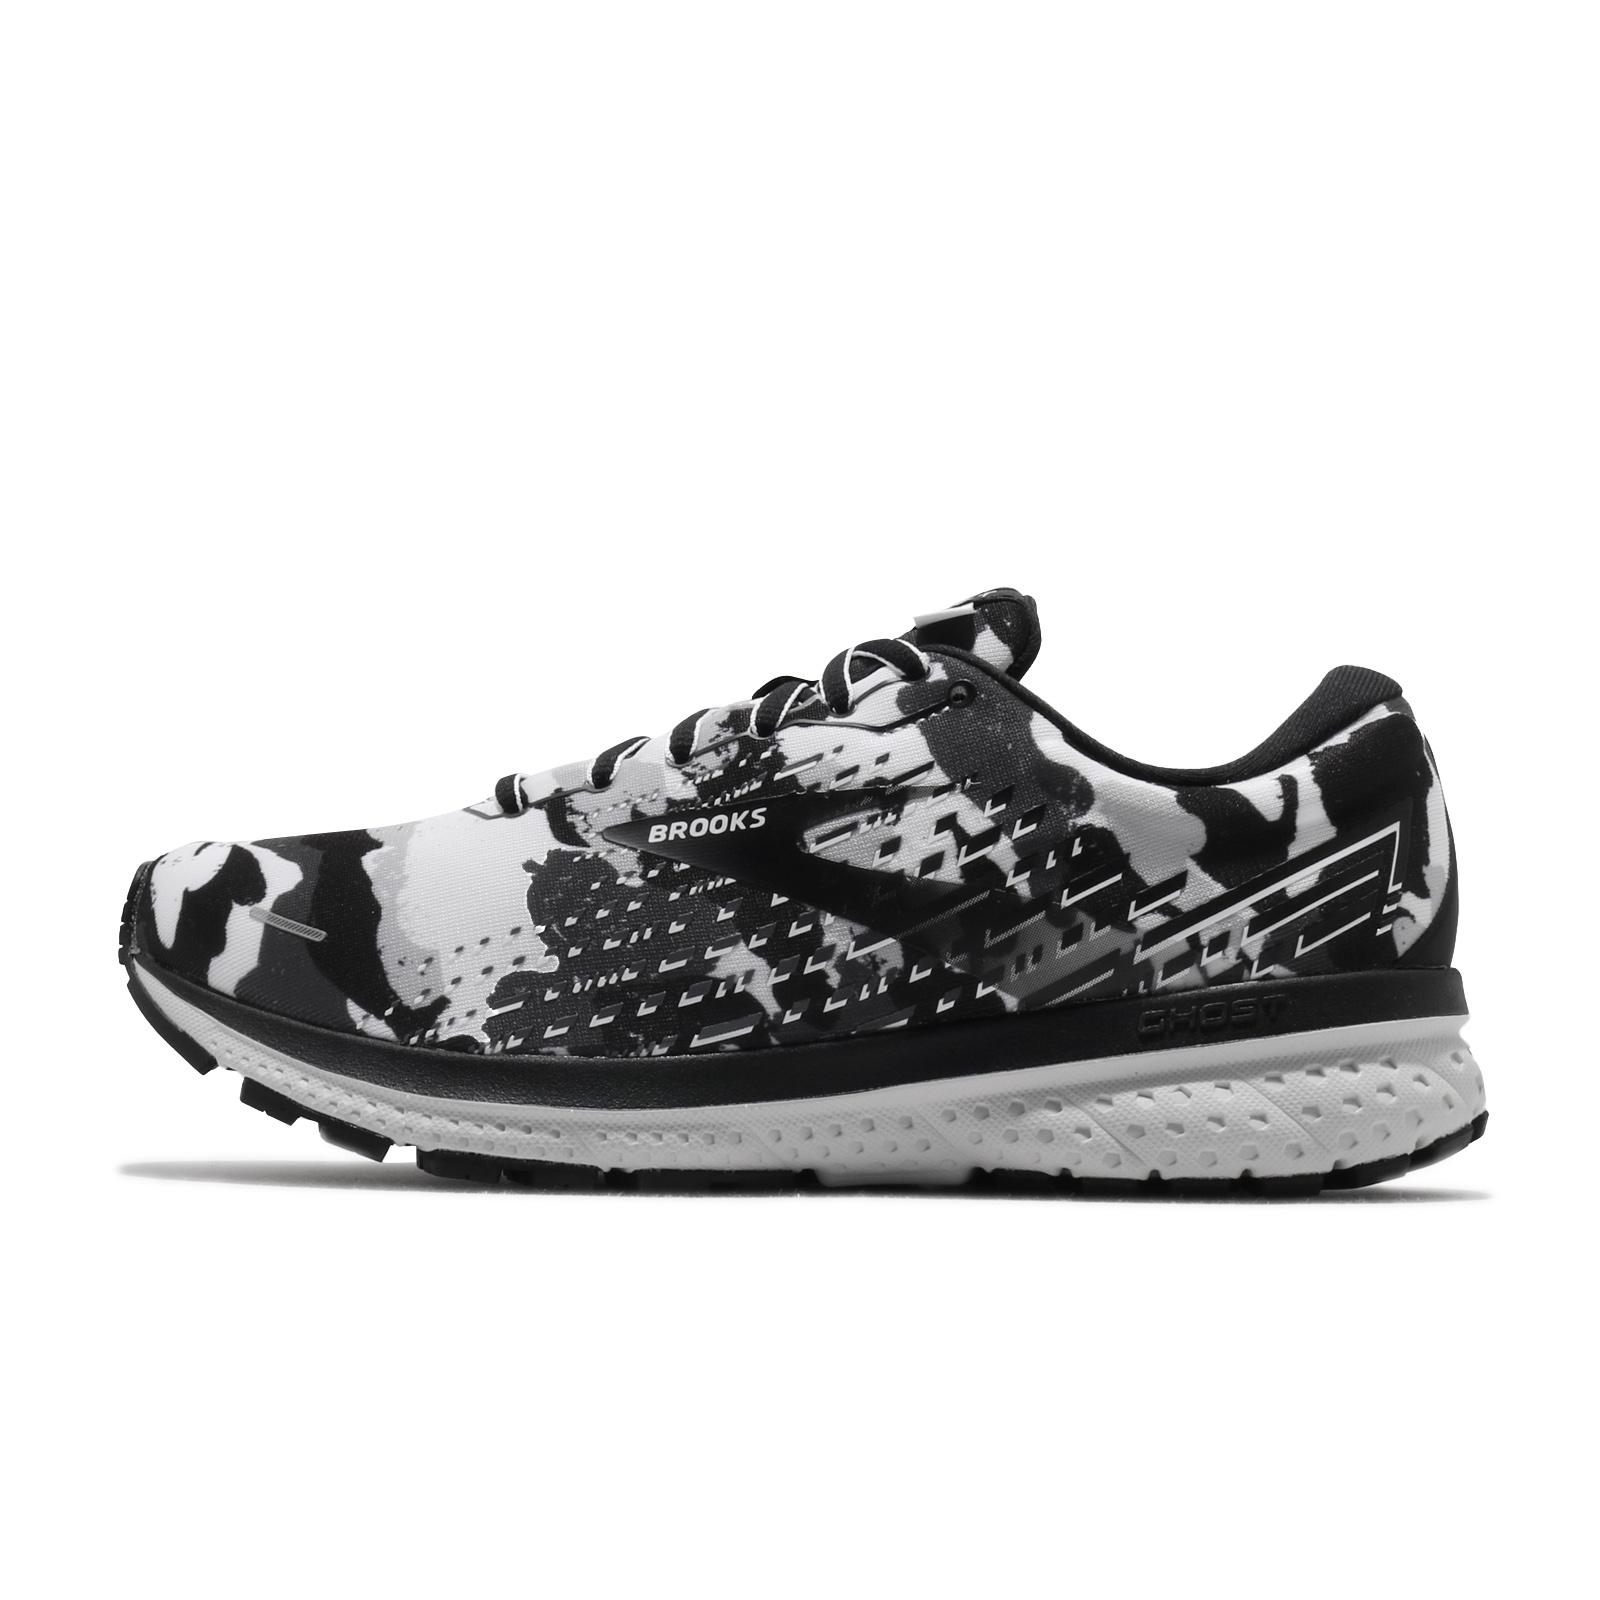 Brooks 慢跑鞋 Ghost 13 男鞋 迷彩限定款 黑 灰 白 高緩衝 馬拉松【ACS】 1103481D-156